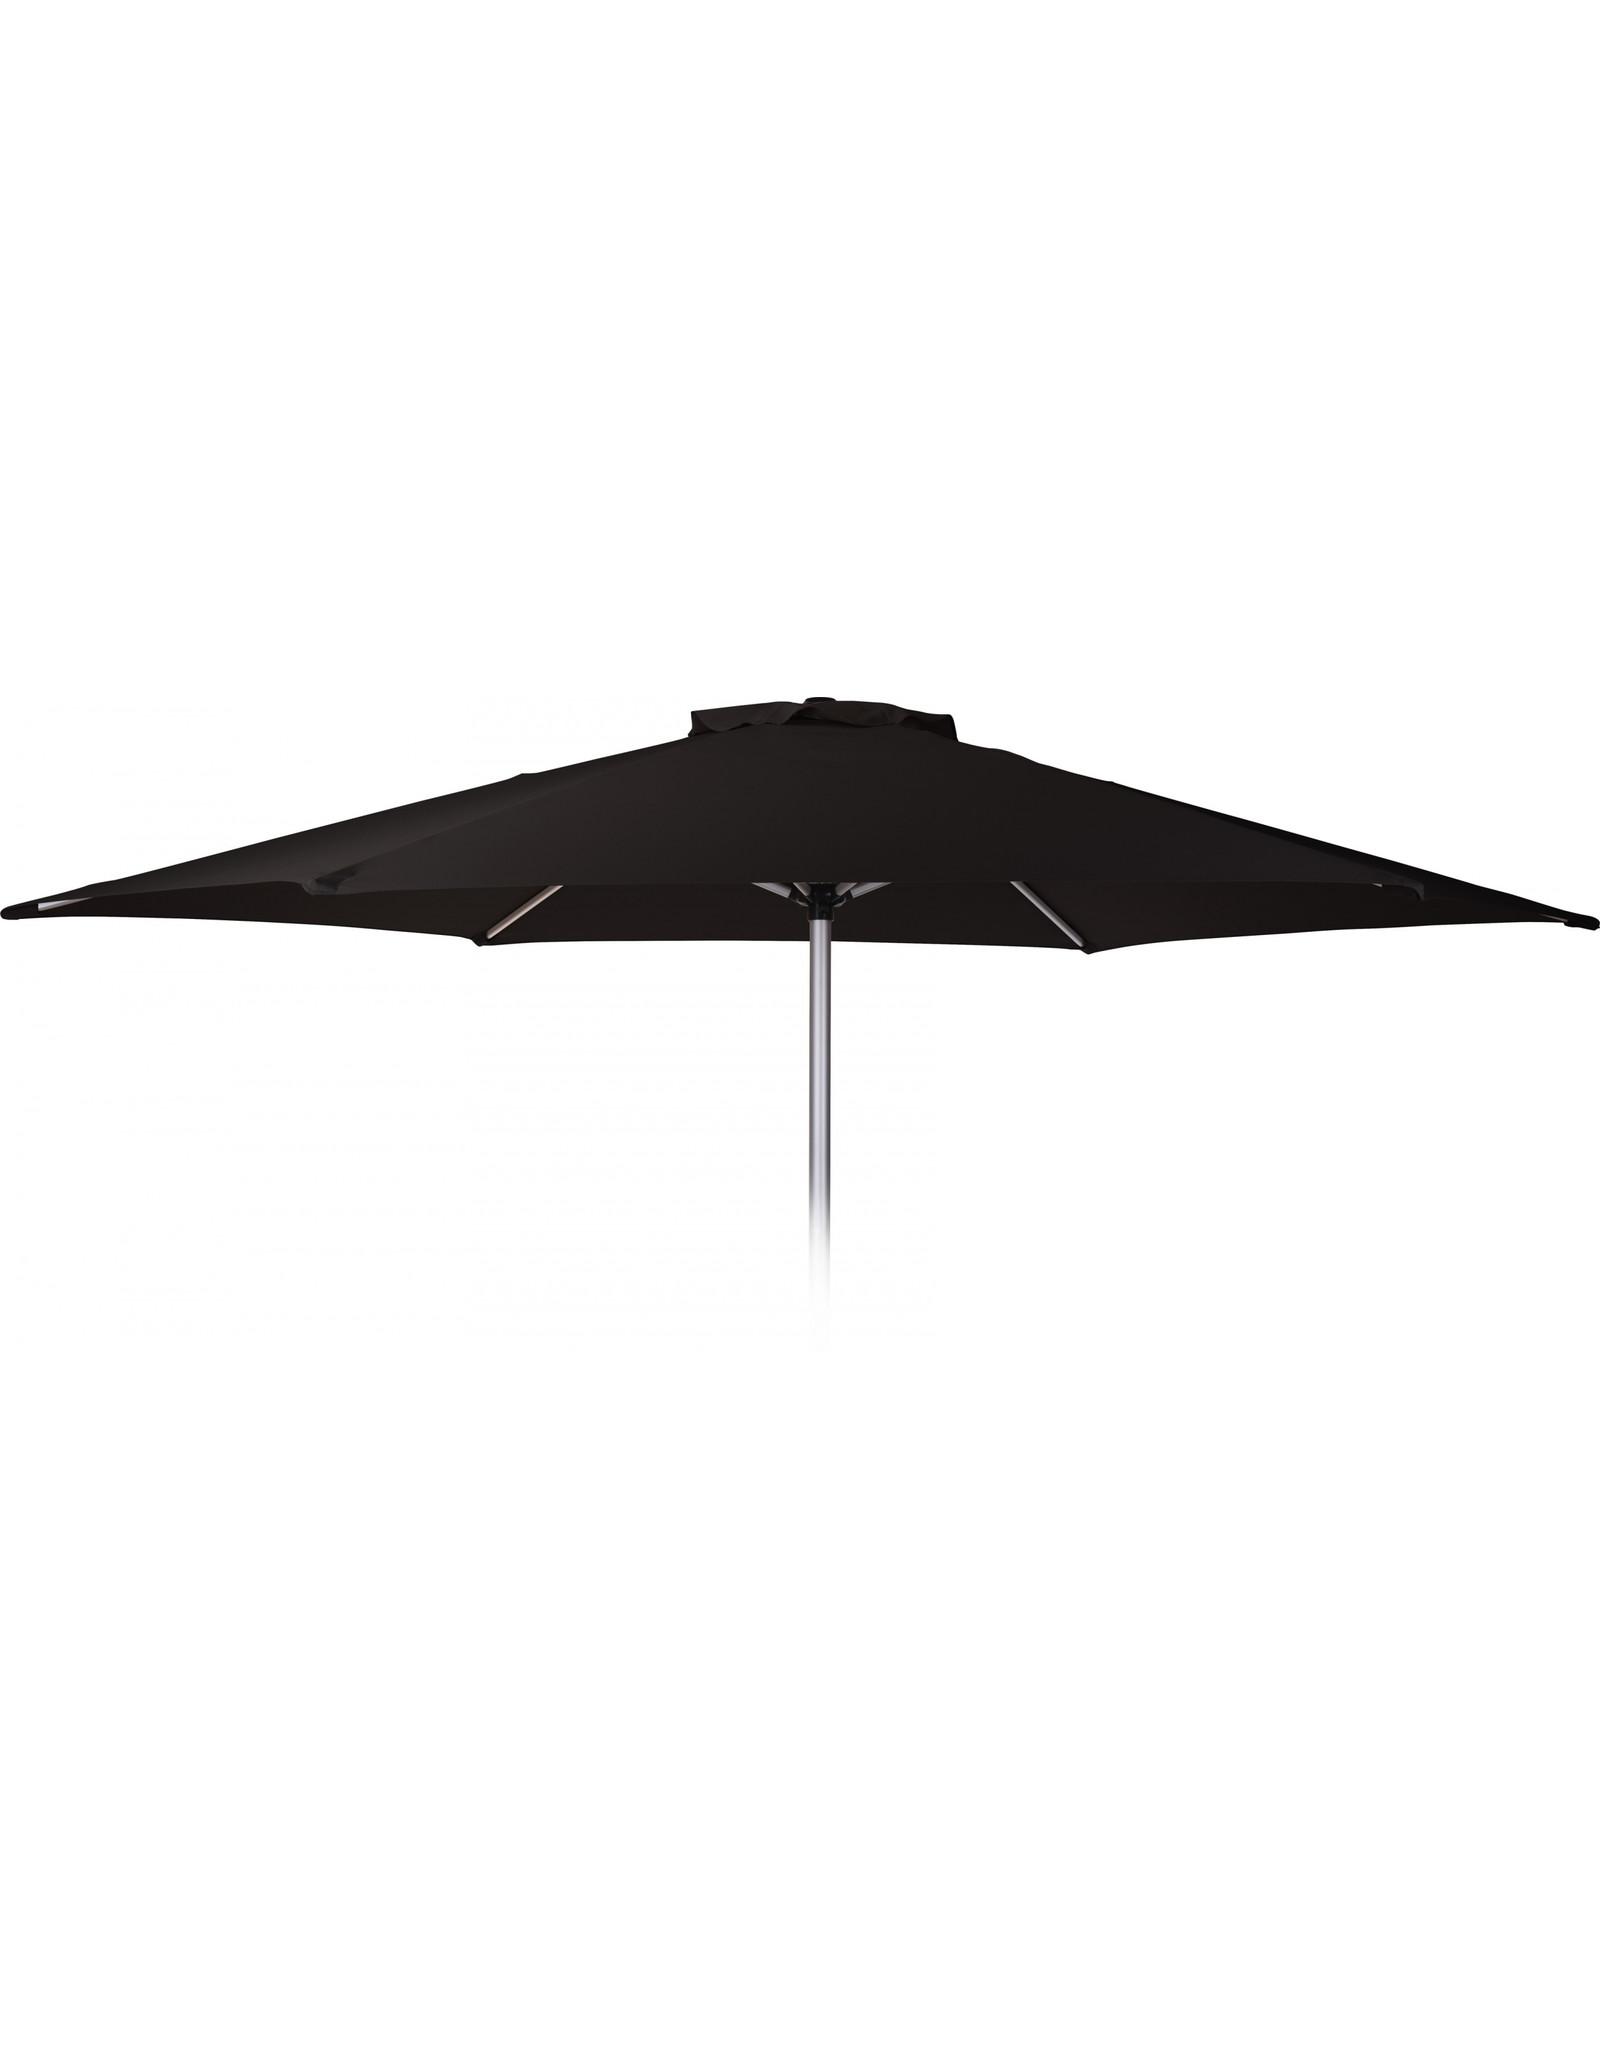 Pro Garden - Parasol - Ø270 cm - Aluminium - Zwart